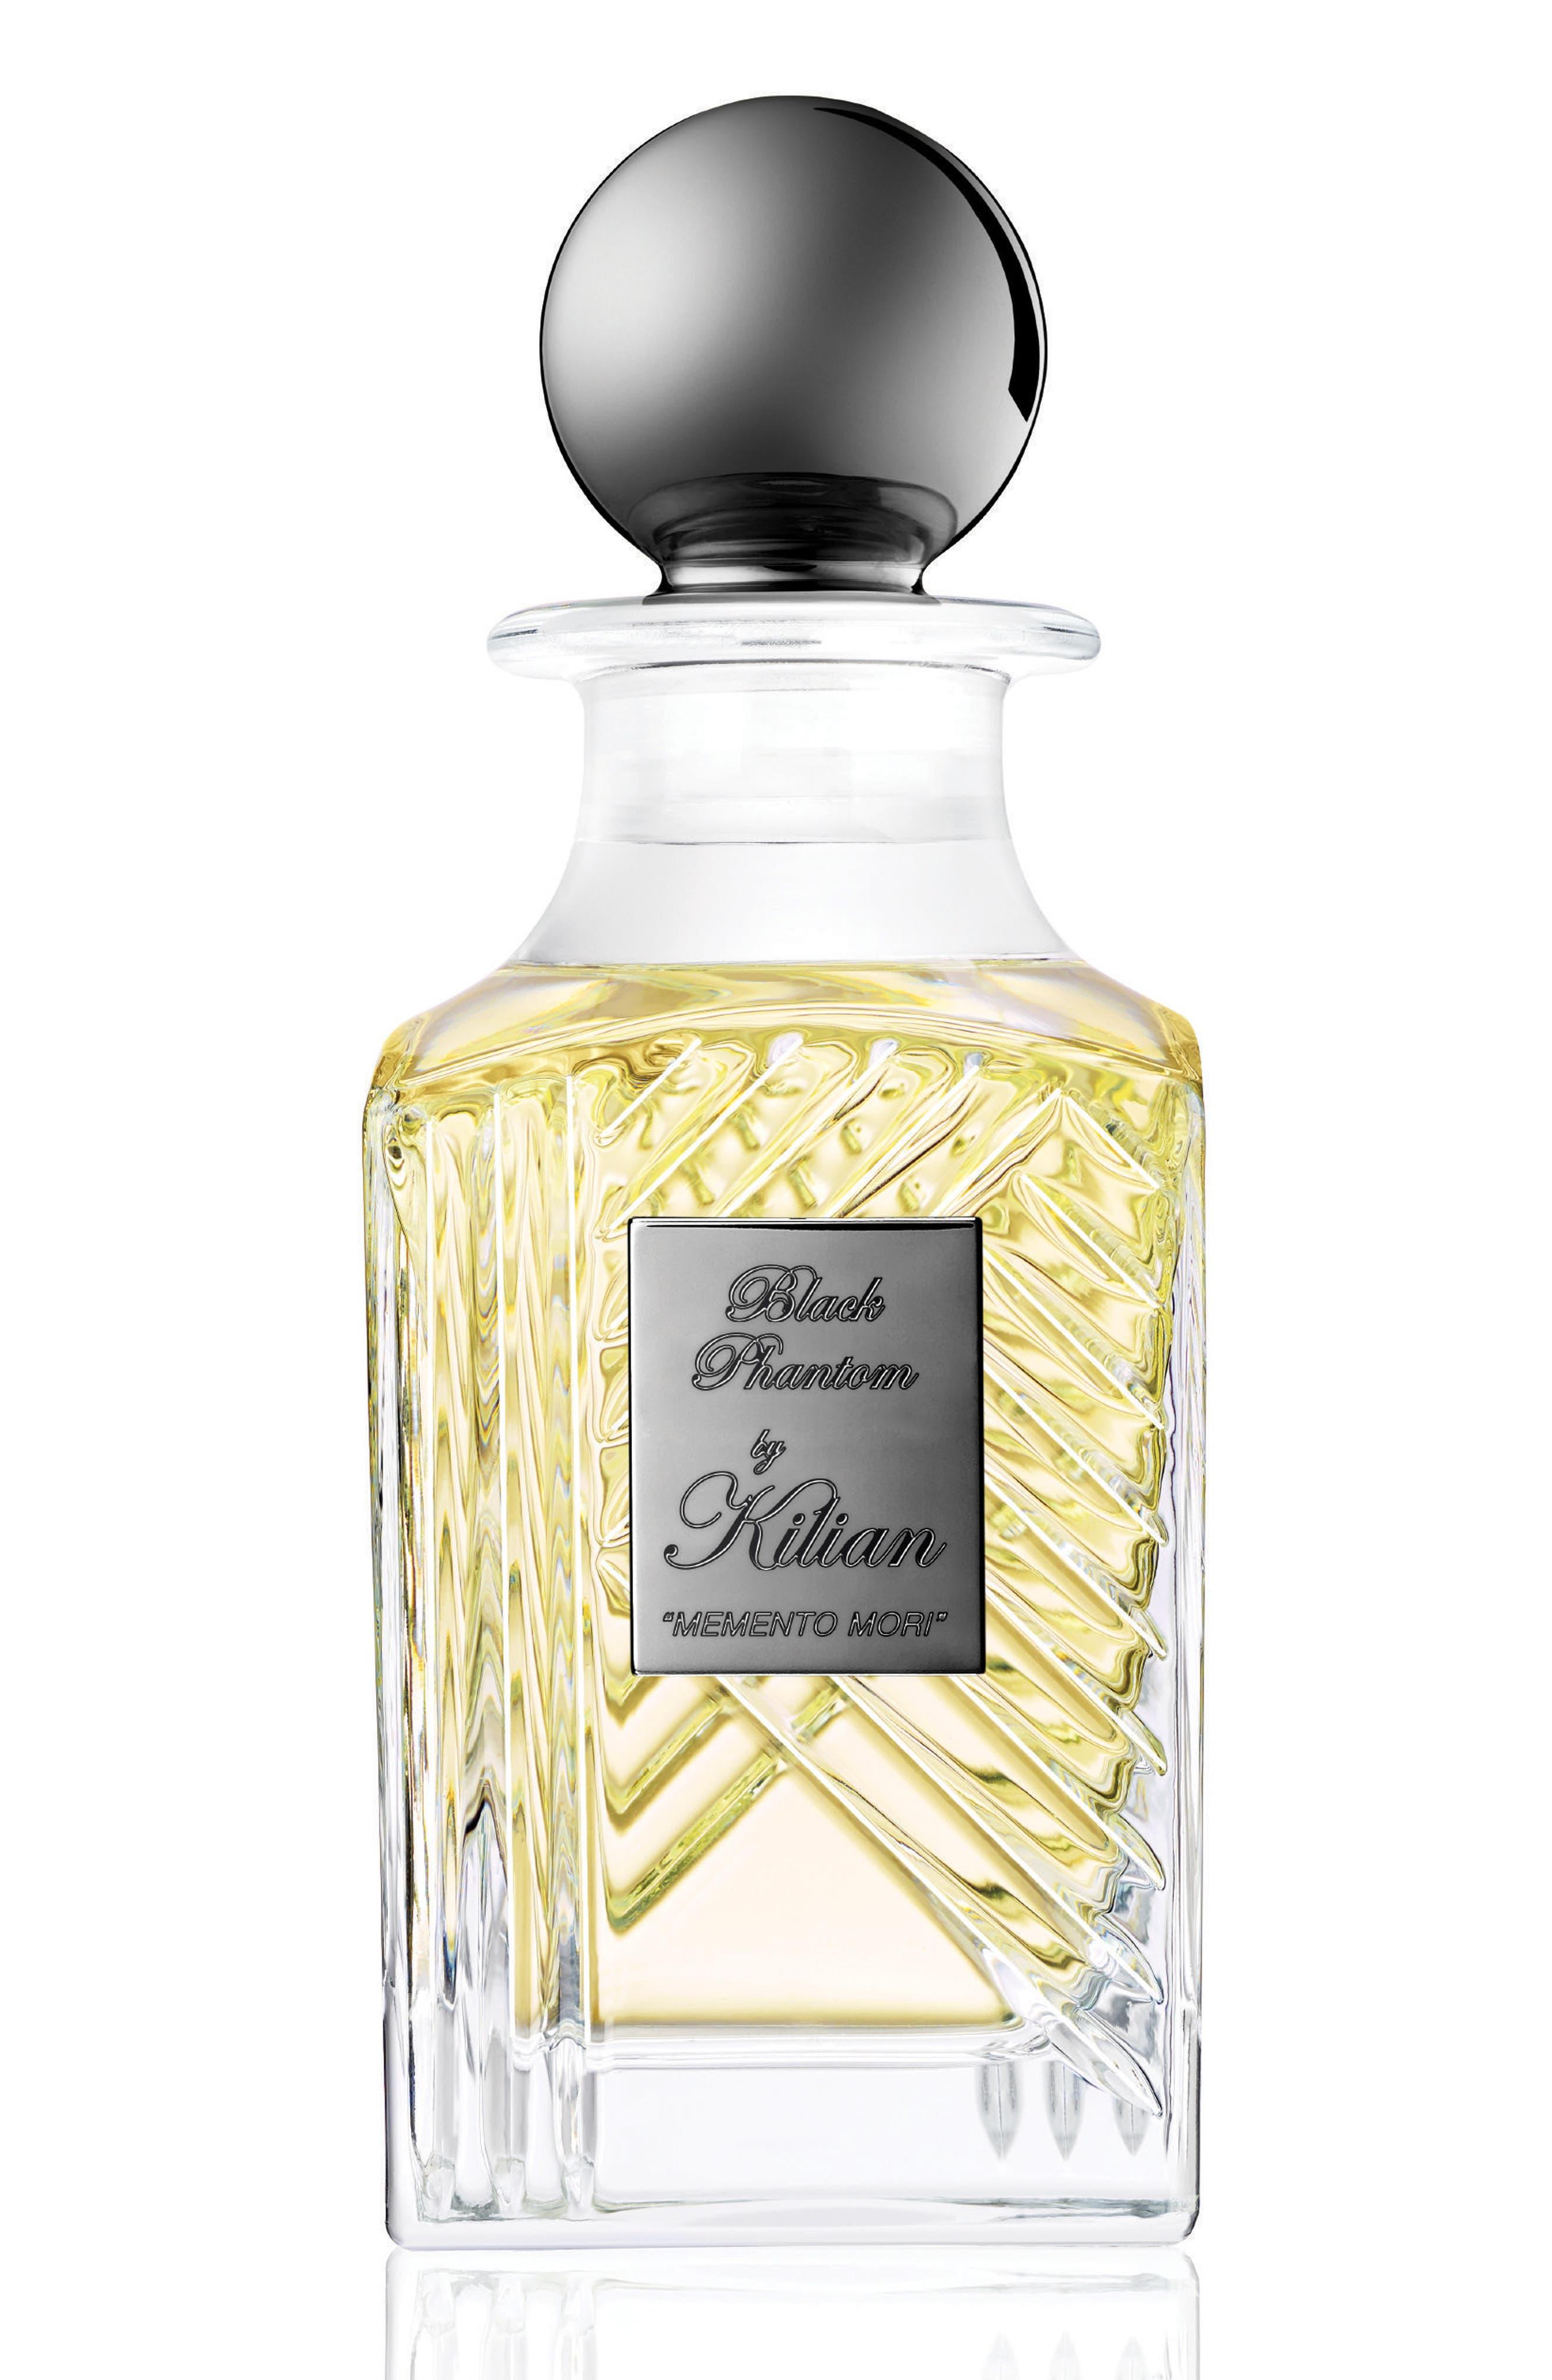 Black Phantom Memento Mori Eau de Parfum Mini Carafe,                             Main thumbnail 1, color,                             NO COLOR